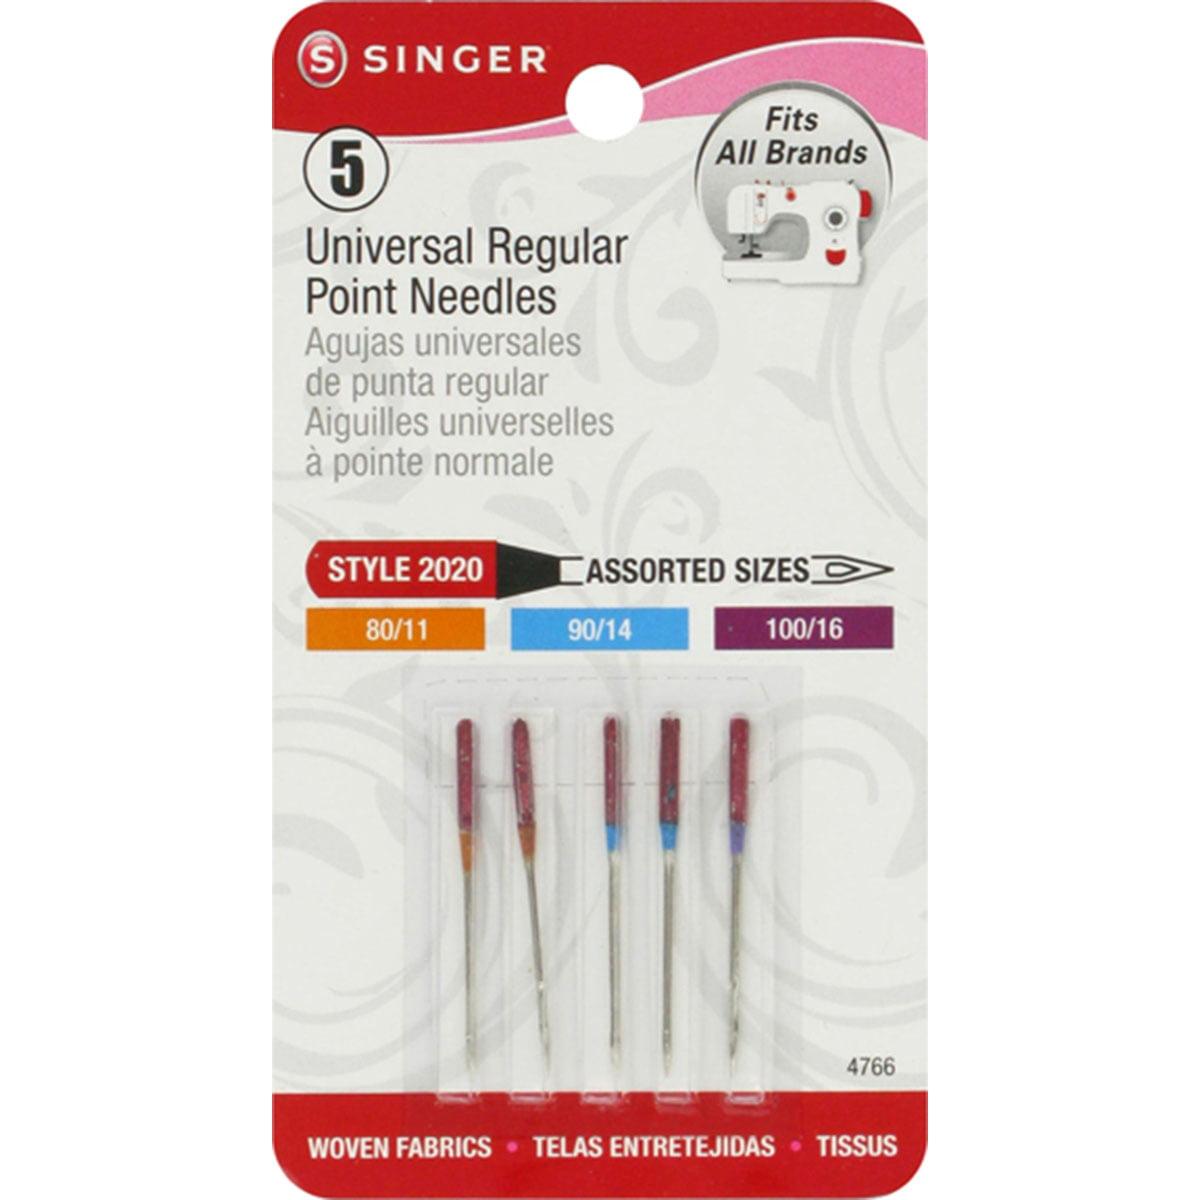 Singer Universal Regular Point Machine Needles-Sizes 11/80 (2), 14/90 (2) & 16/100 (1)